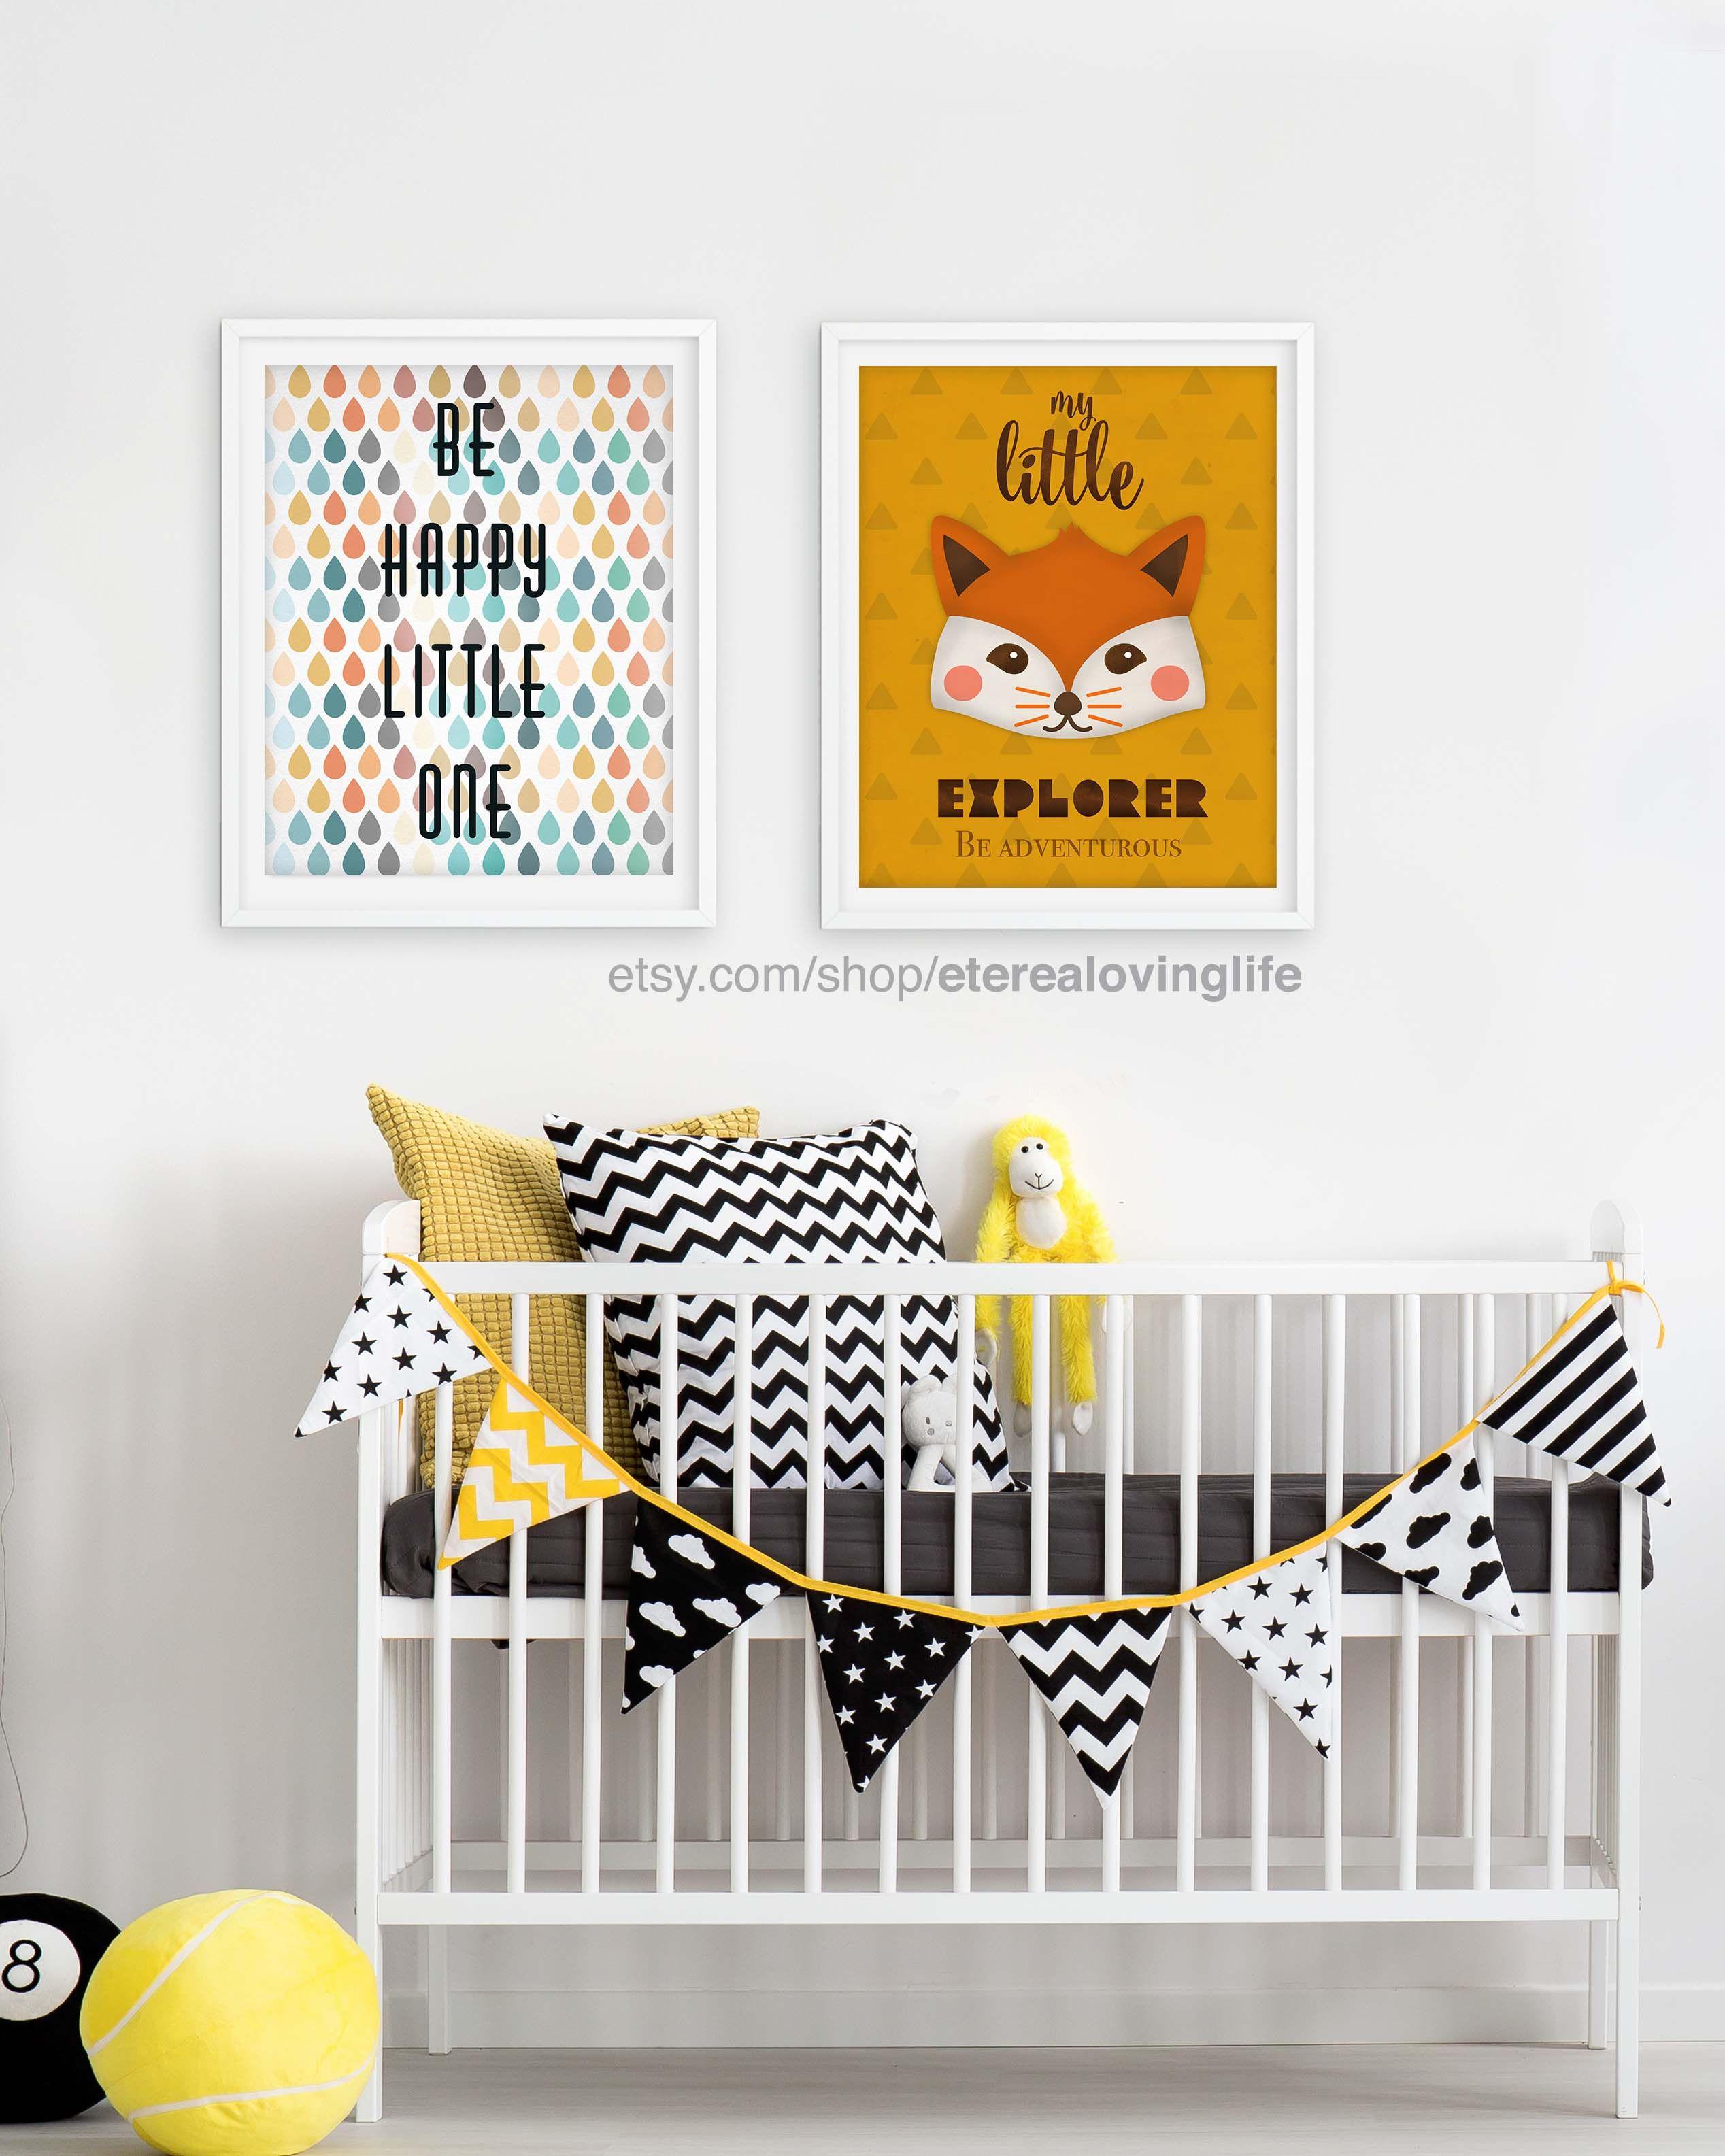 Explorer Printable With Baby Fox